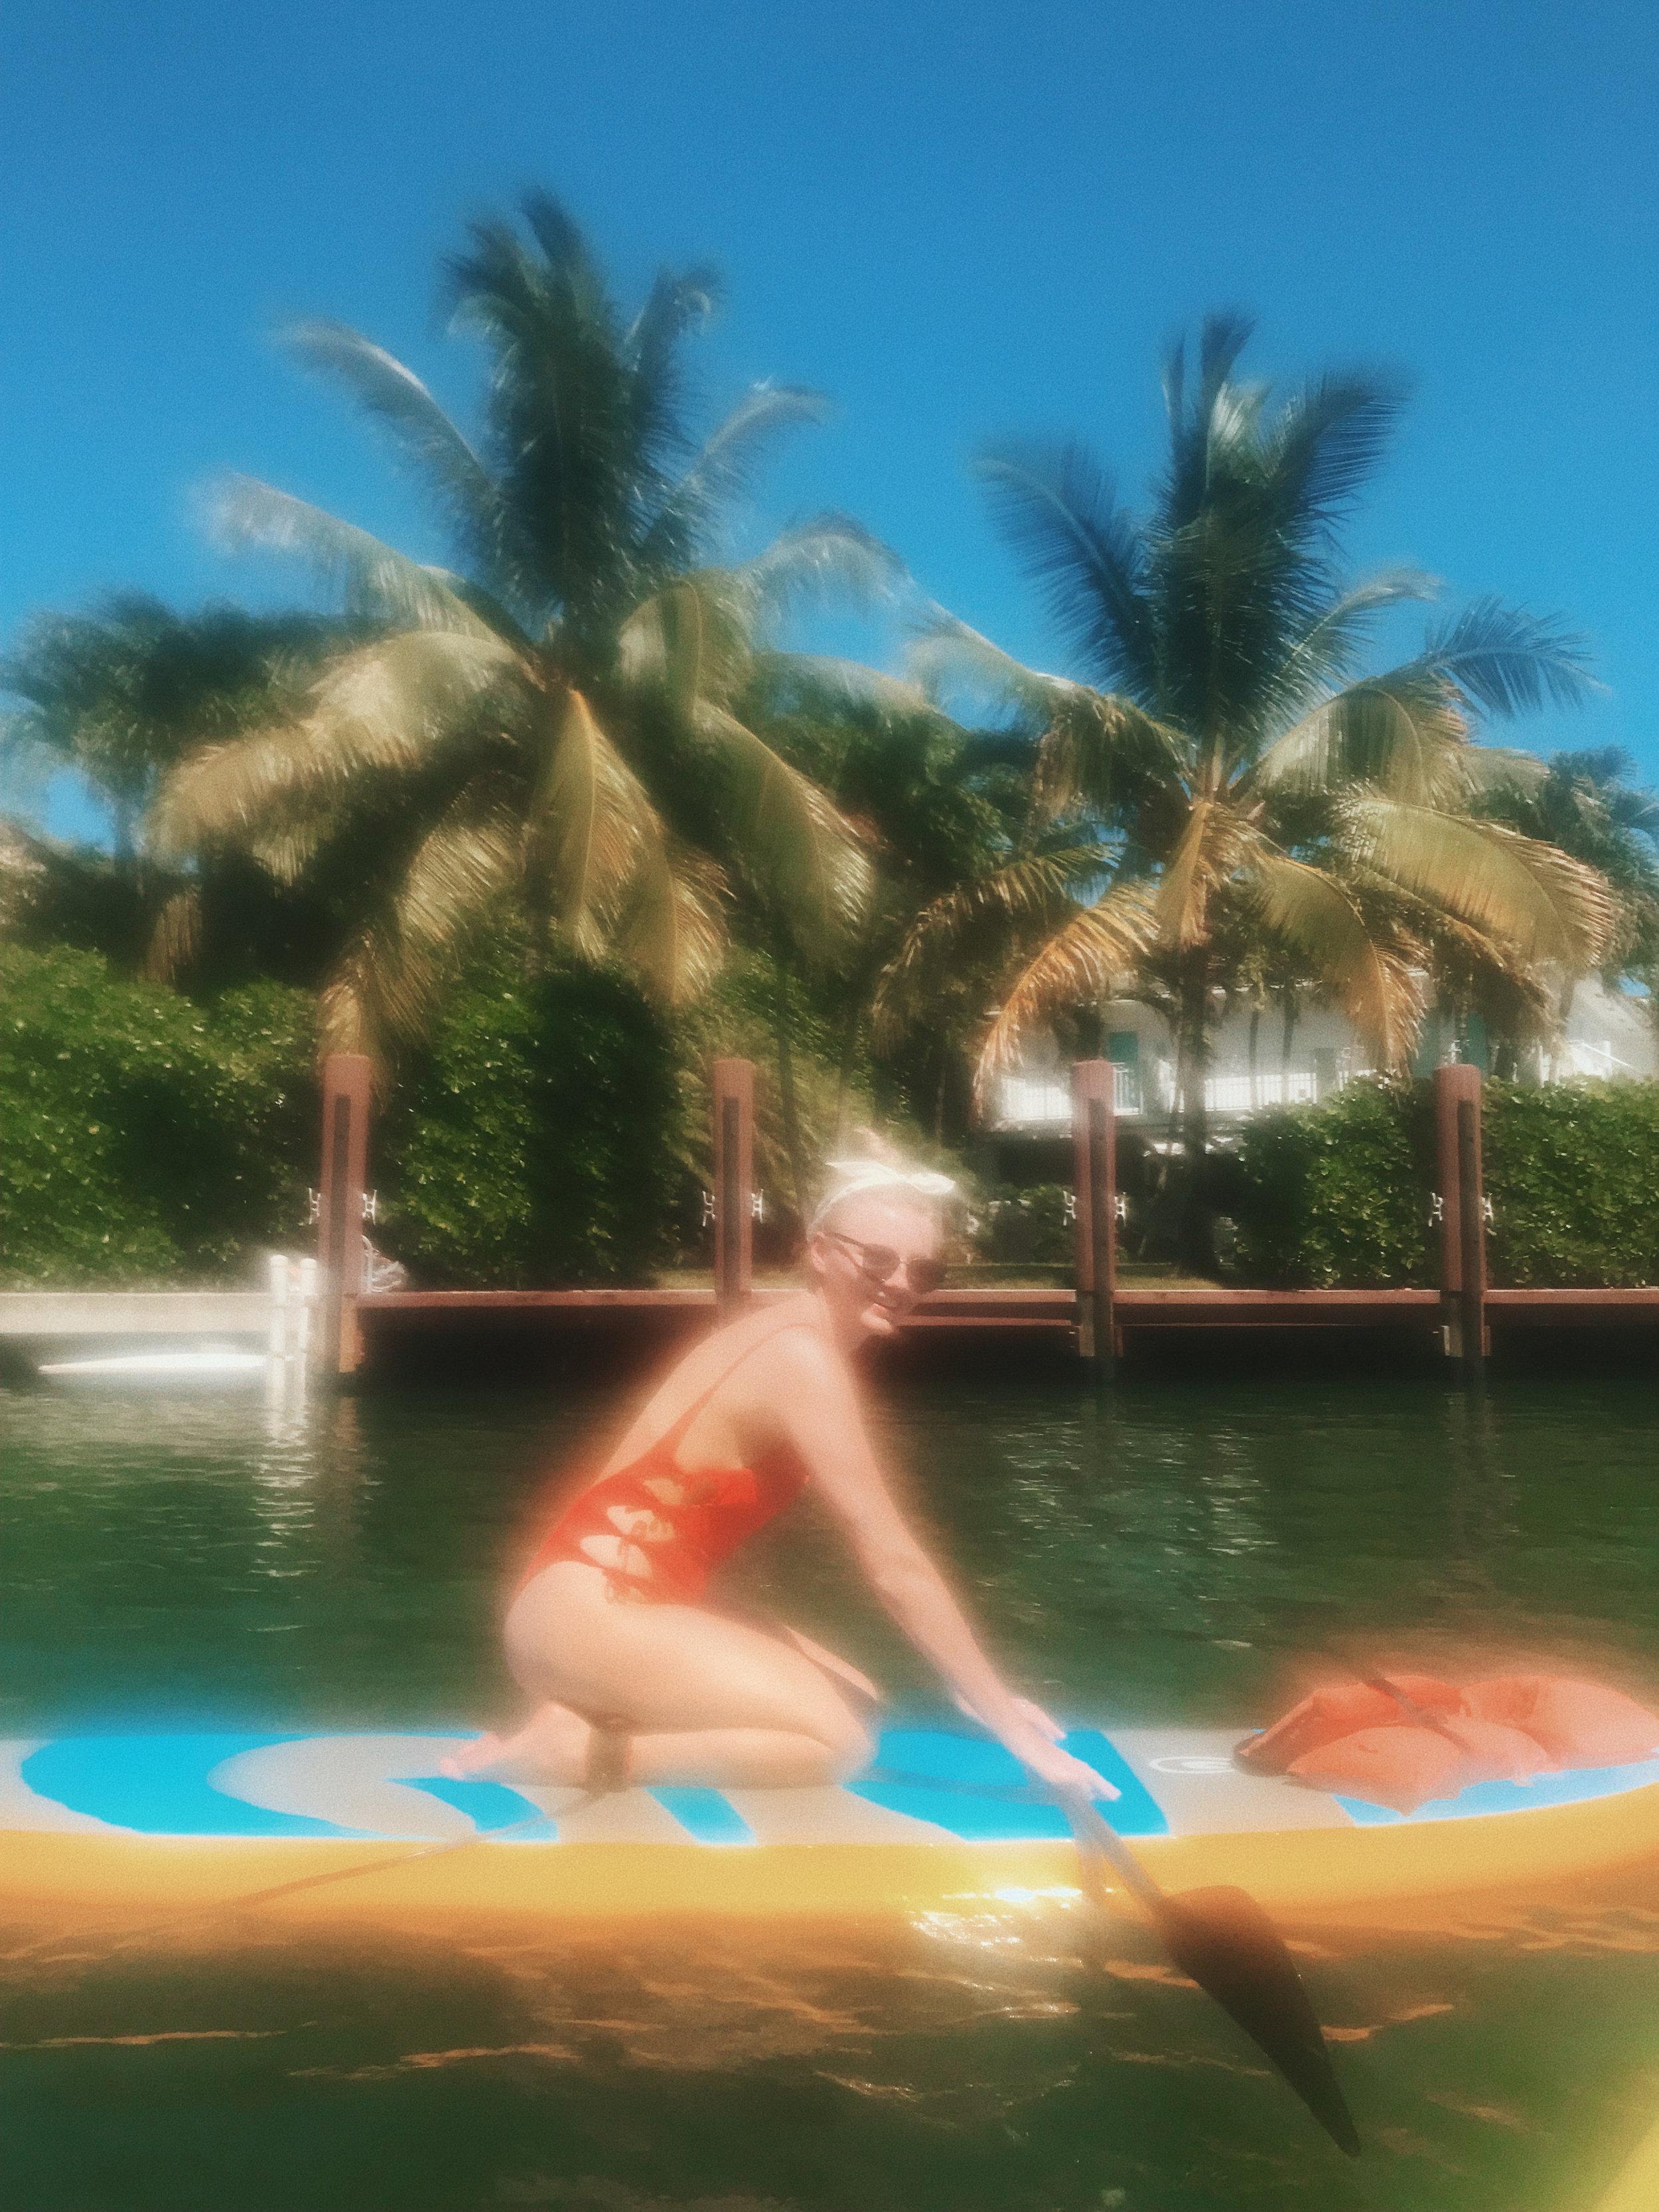 20180805_South Beach Kayak - Miami Beach Paddle Board_1.jpg